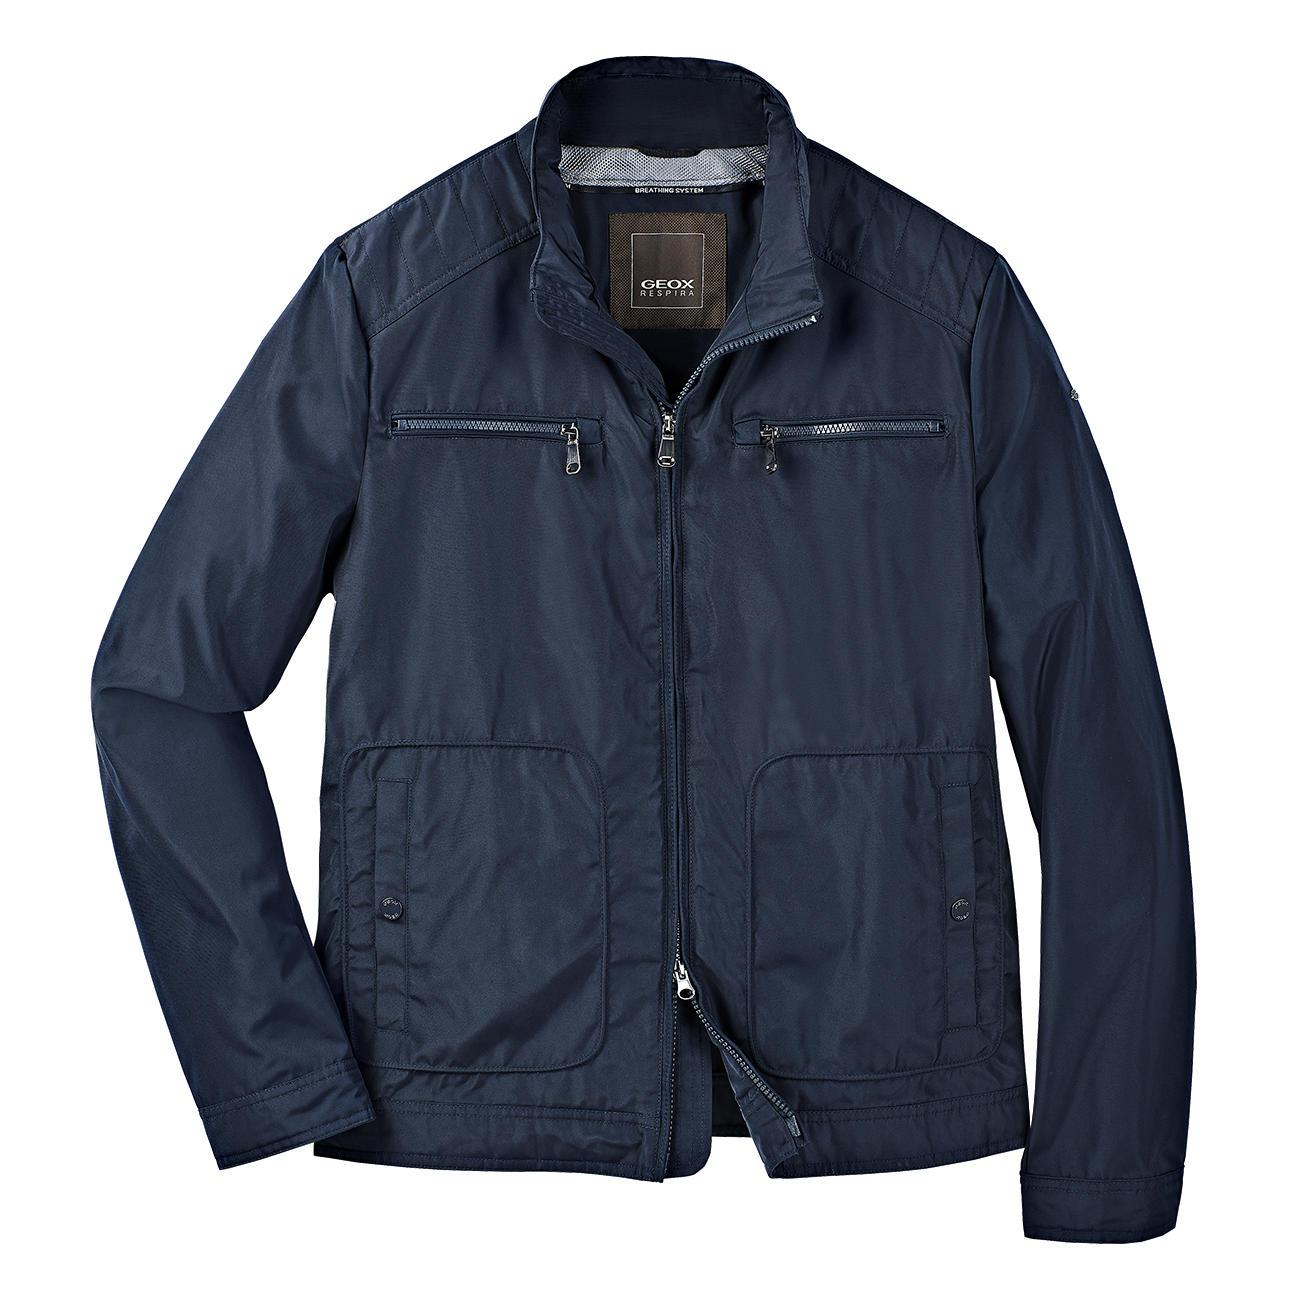 "aktuelles Styling online erstklassig Geox Men's Functional Field Jacket ""Breathing System"""